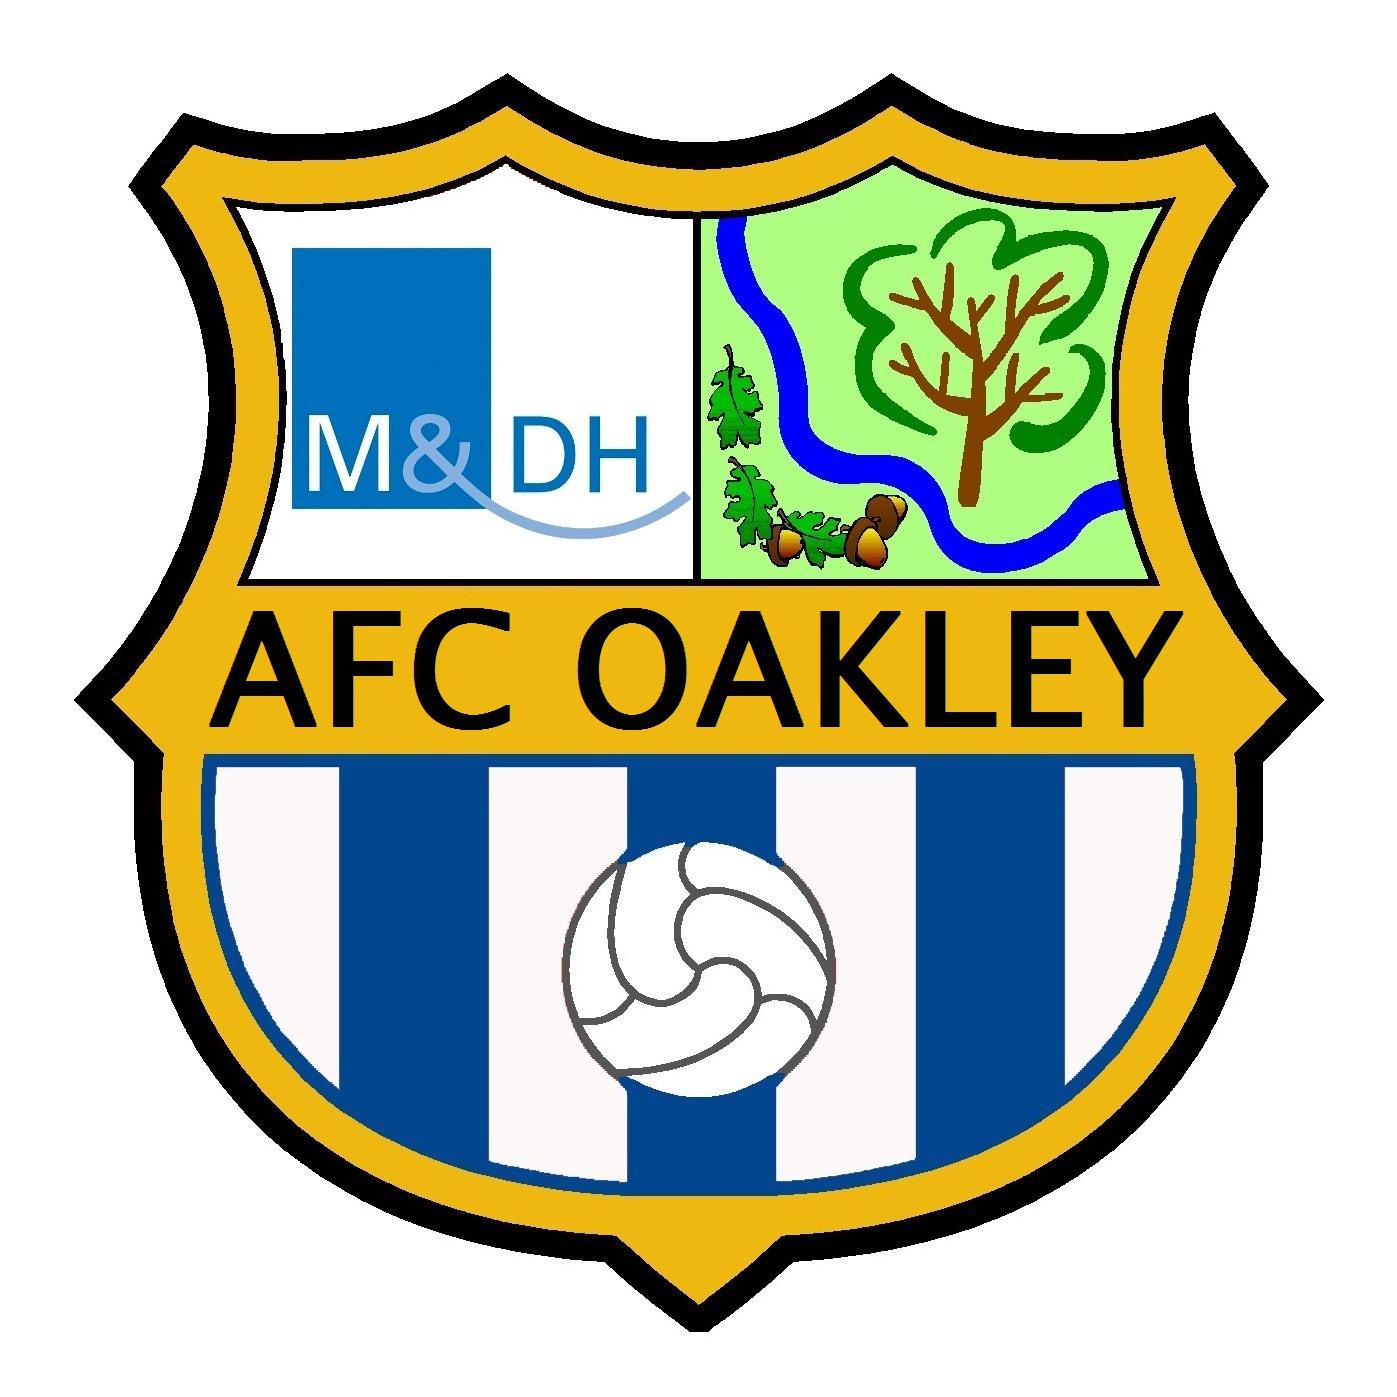 Image result for afc oakley mdh